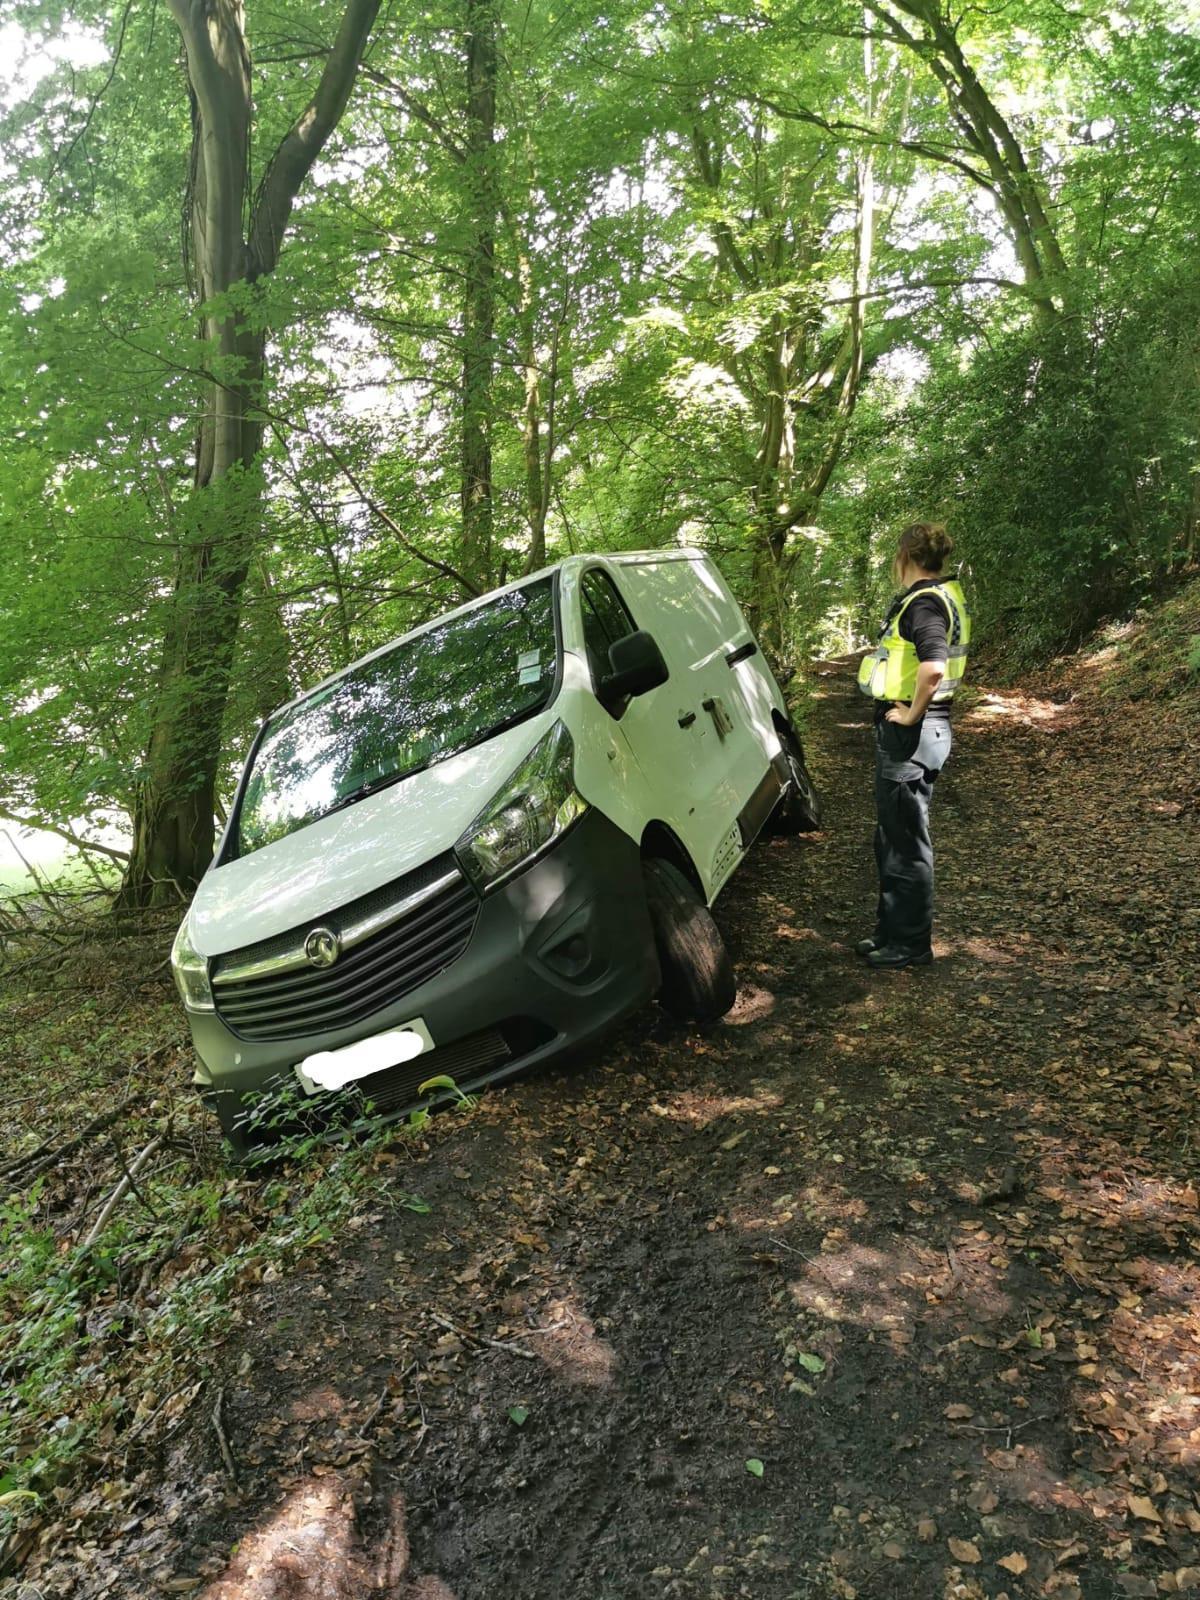 11505027 - Van almost tumbles down Cooper's Hill after following sat-nav